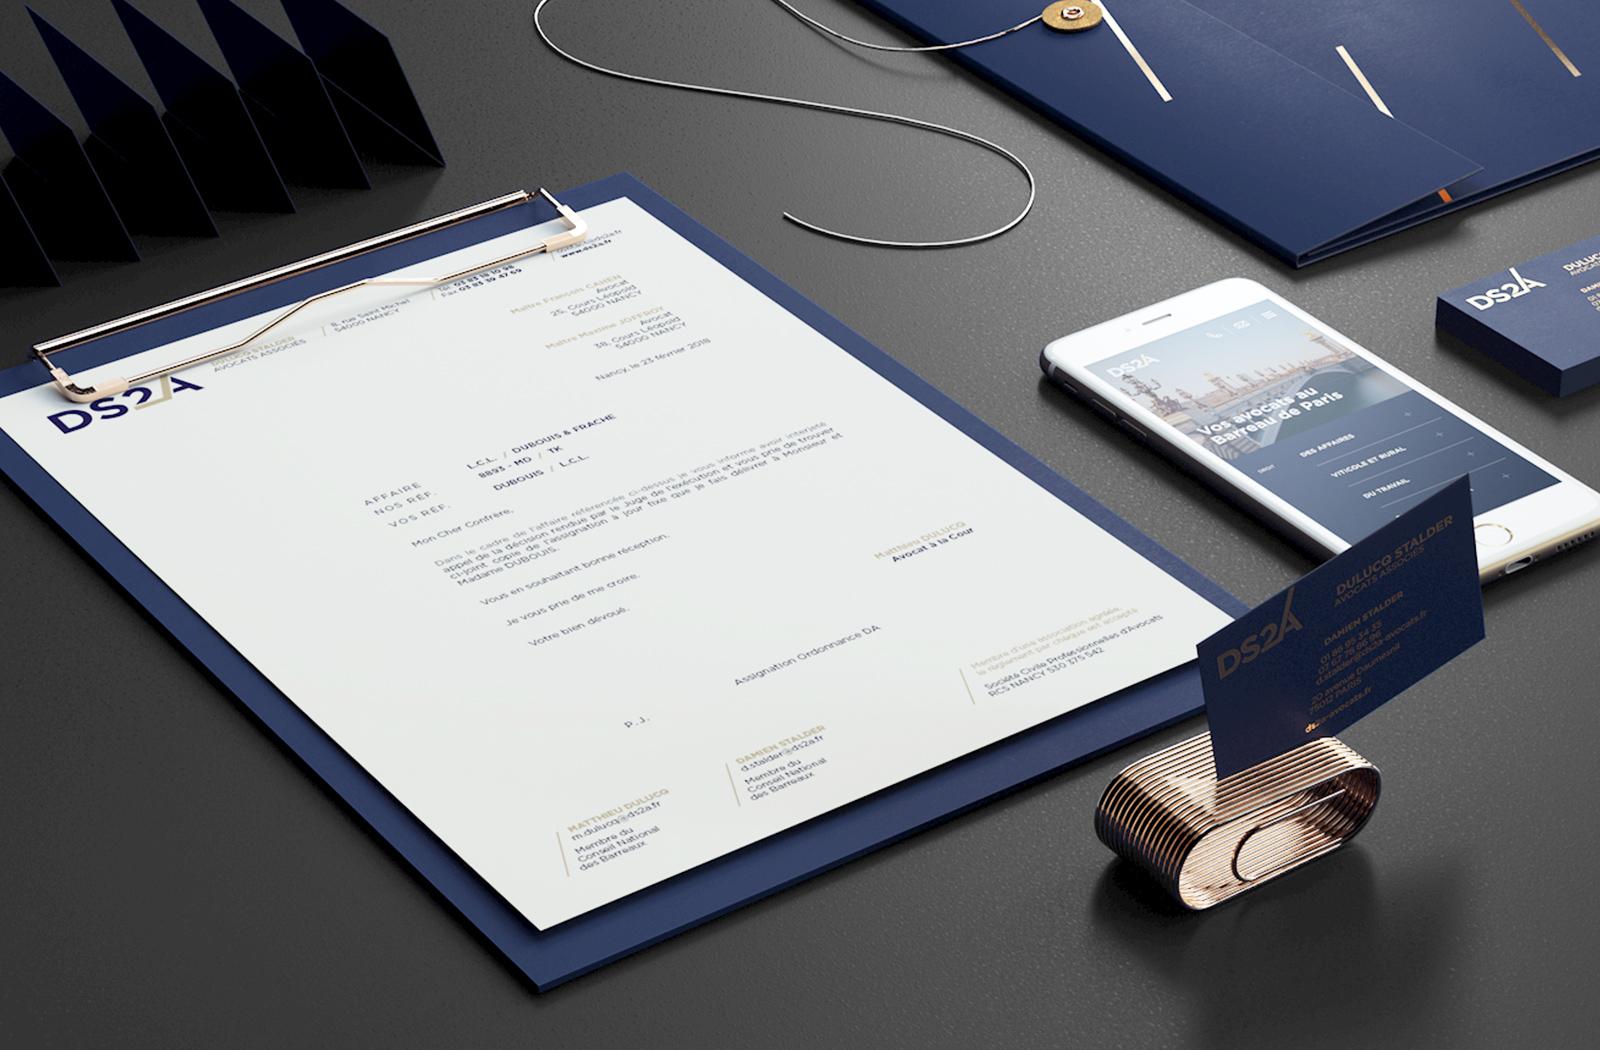 DS2A-Dulucq-stalder-avocats-branding-josselin-tourette-full-4